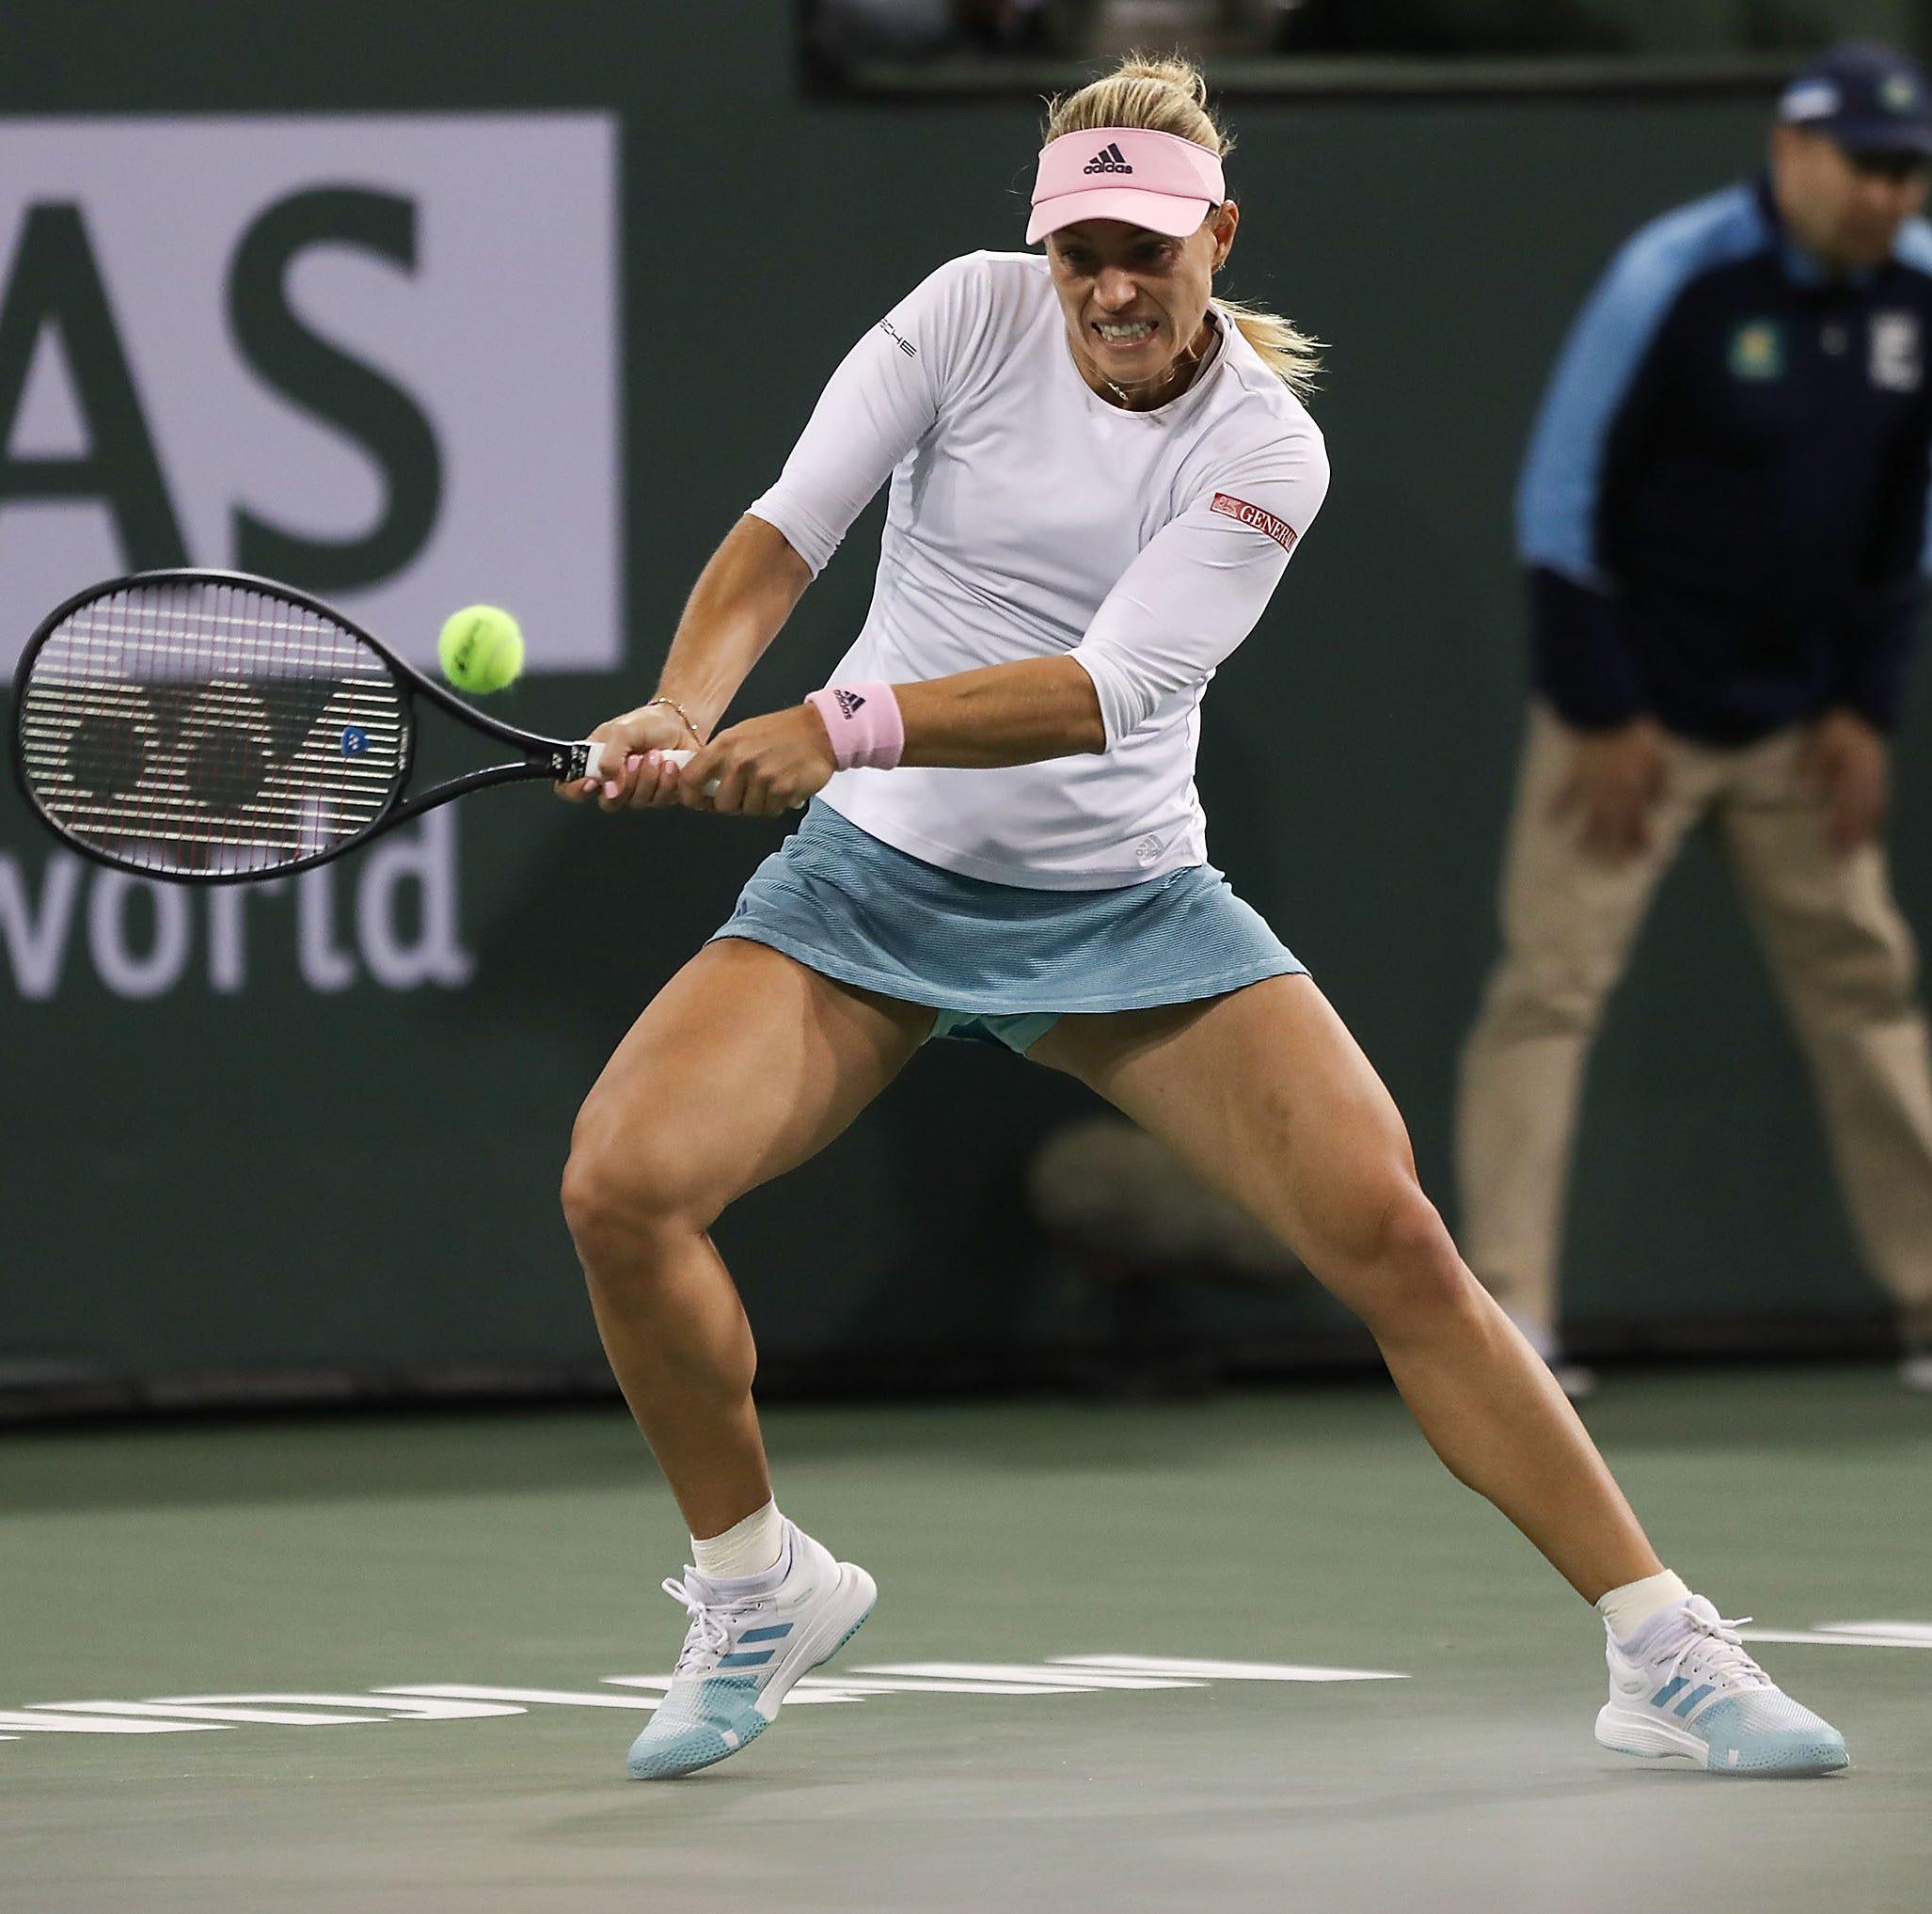 Angelique Kerber has BNP Paribas Open breakthrough, advances to first Indian Wells final